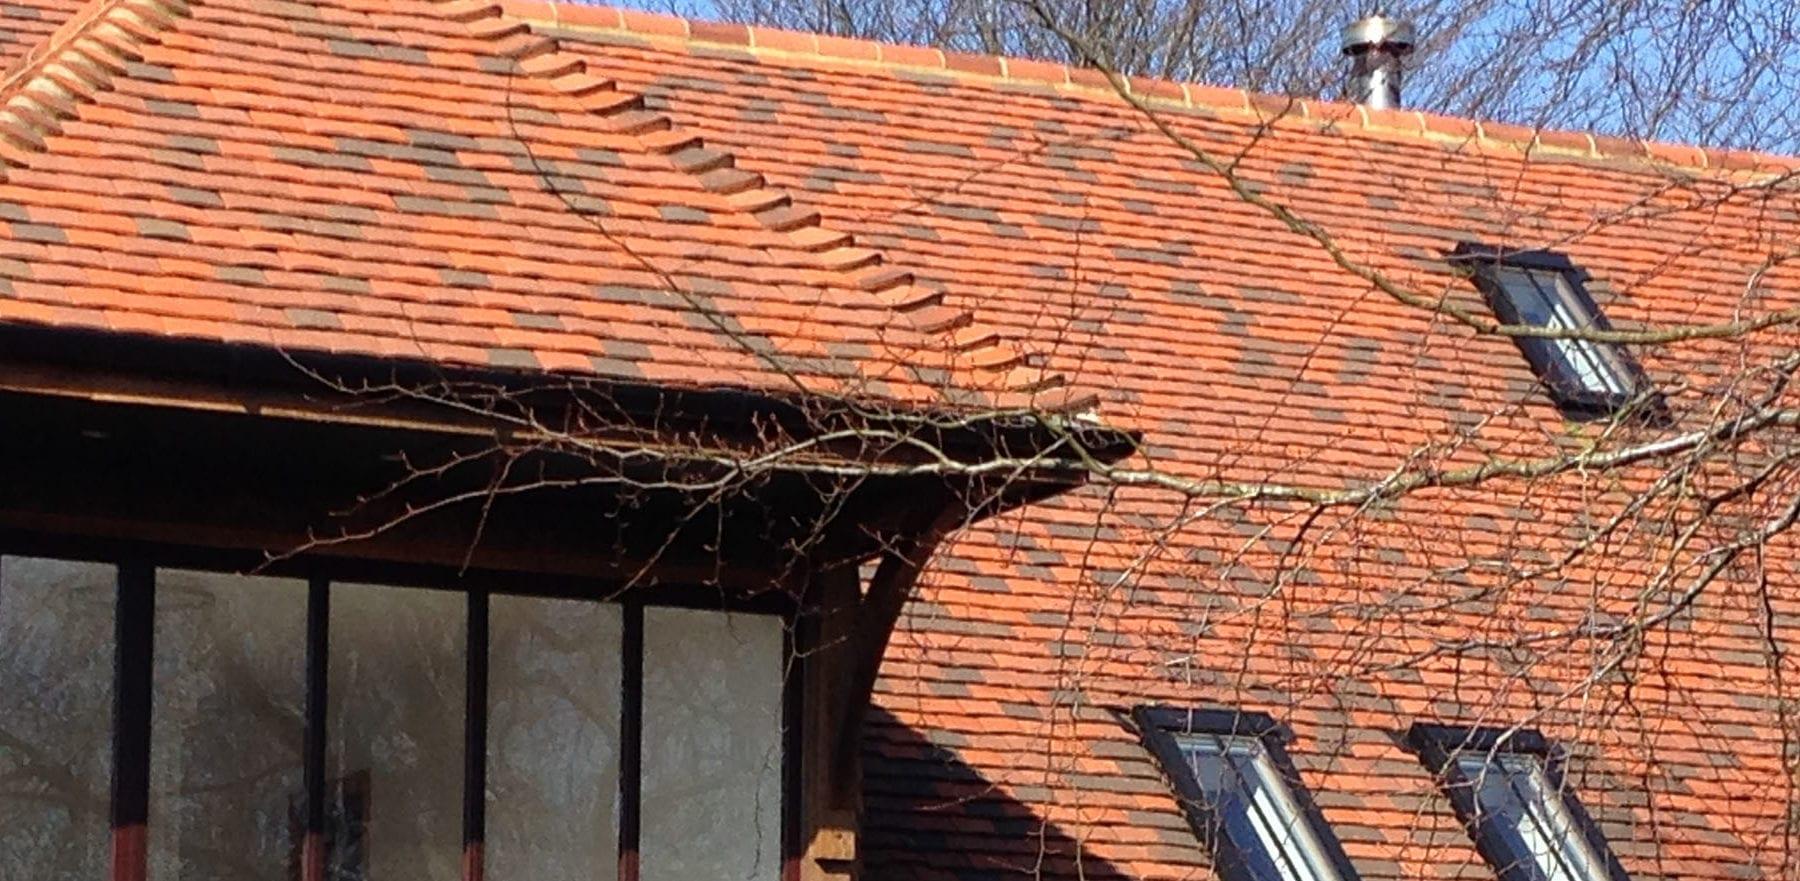 Lifestiles - Handcrafted Tilehurst Clay Roof Tiles - Folkstone, England 3